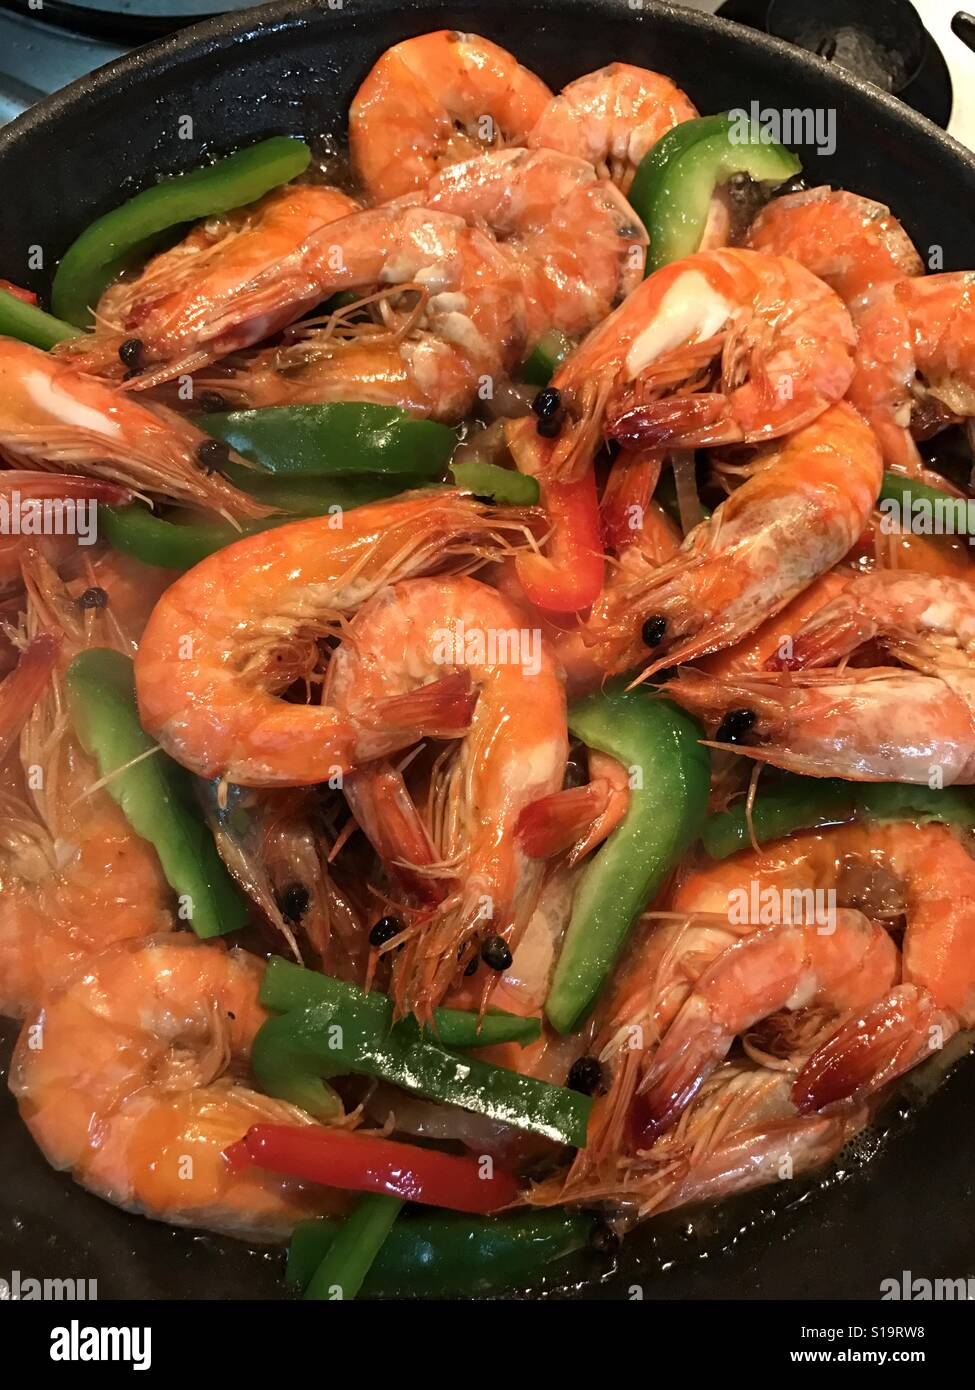 Tasty Shrimp - Stock Image